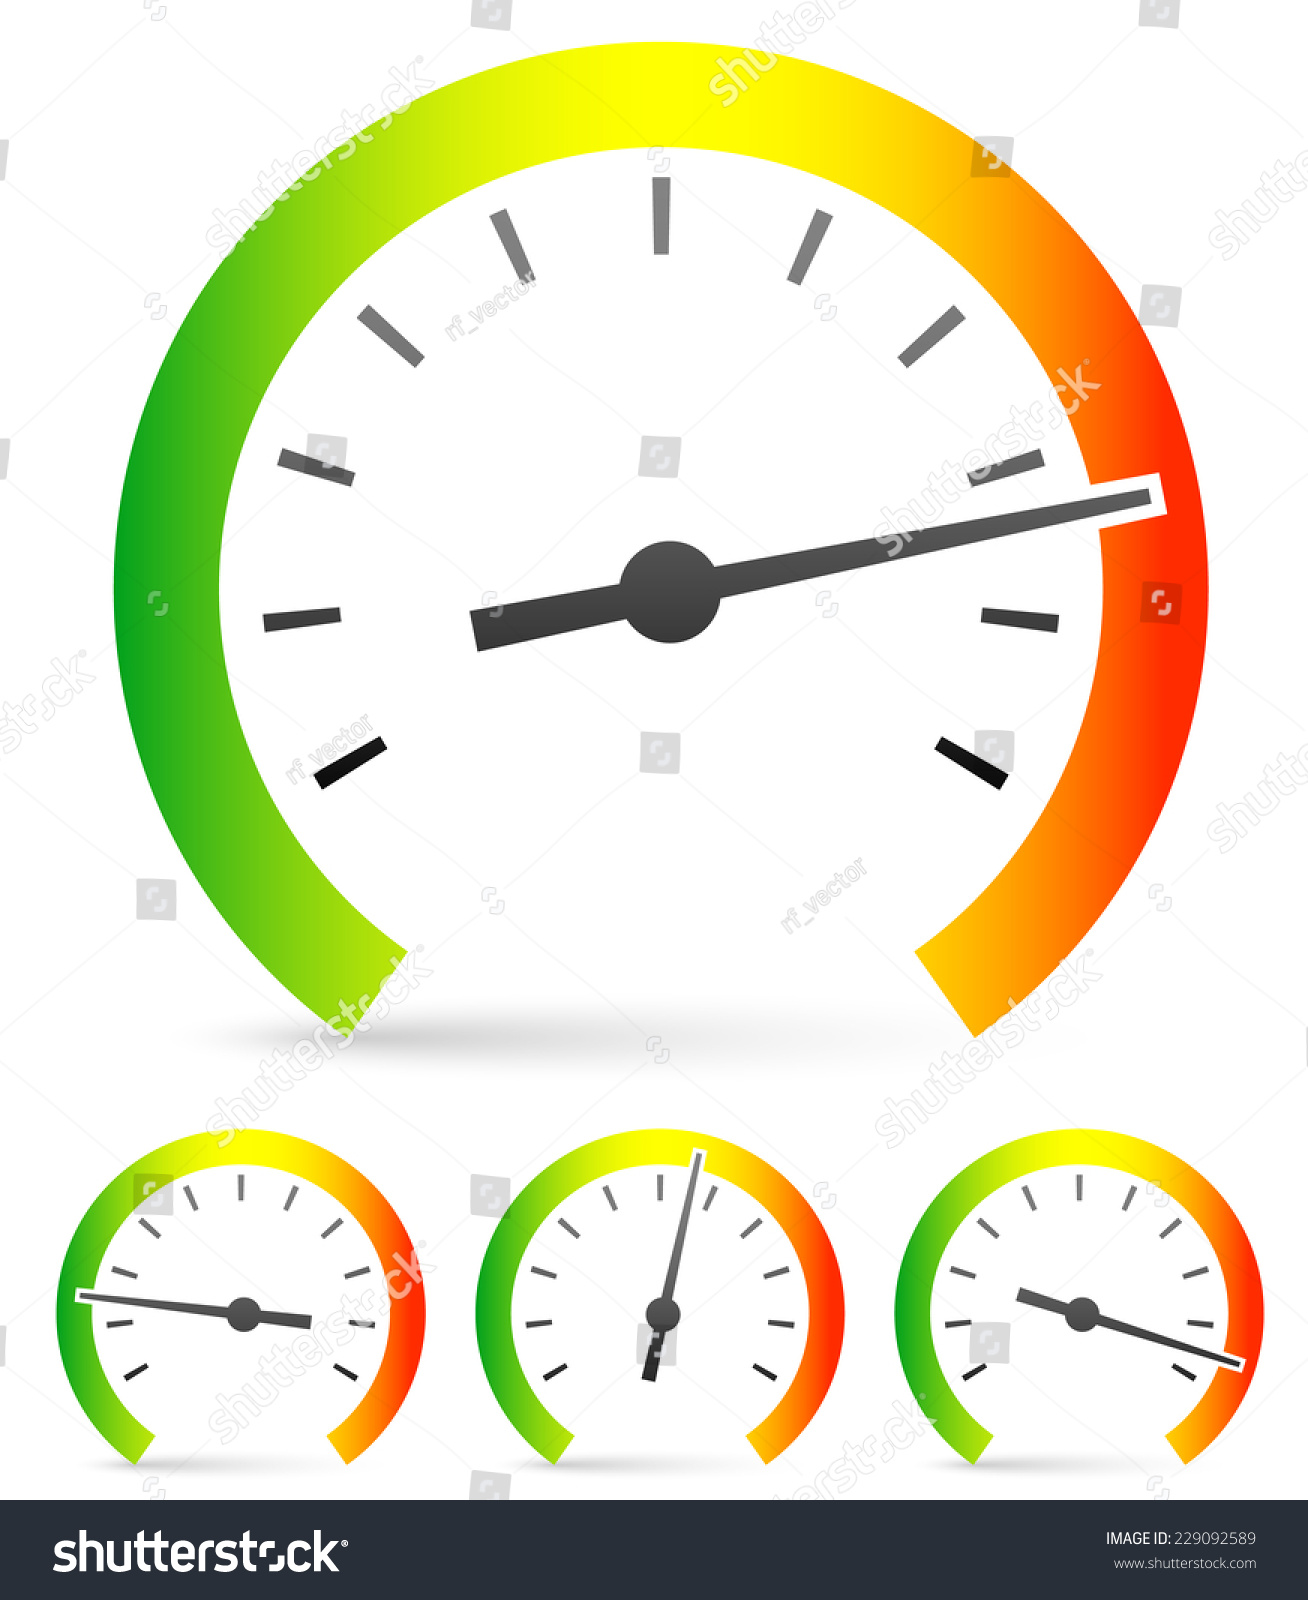 Speedometer General Gauge Dial Template Measuring Stock